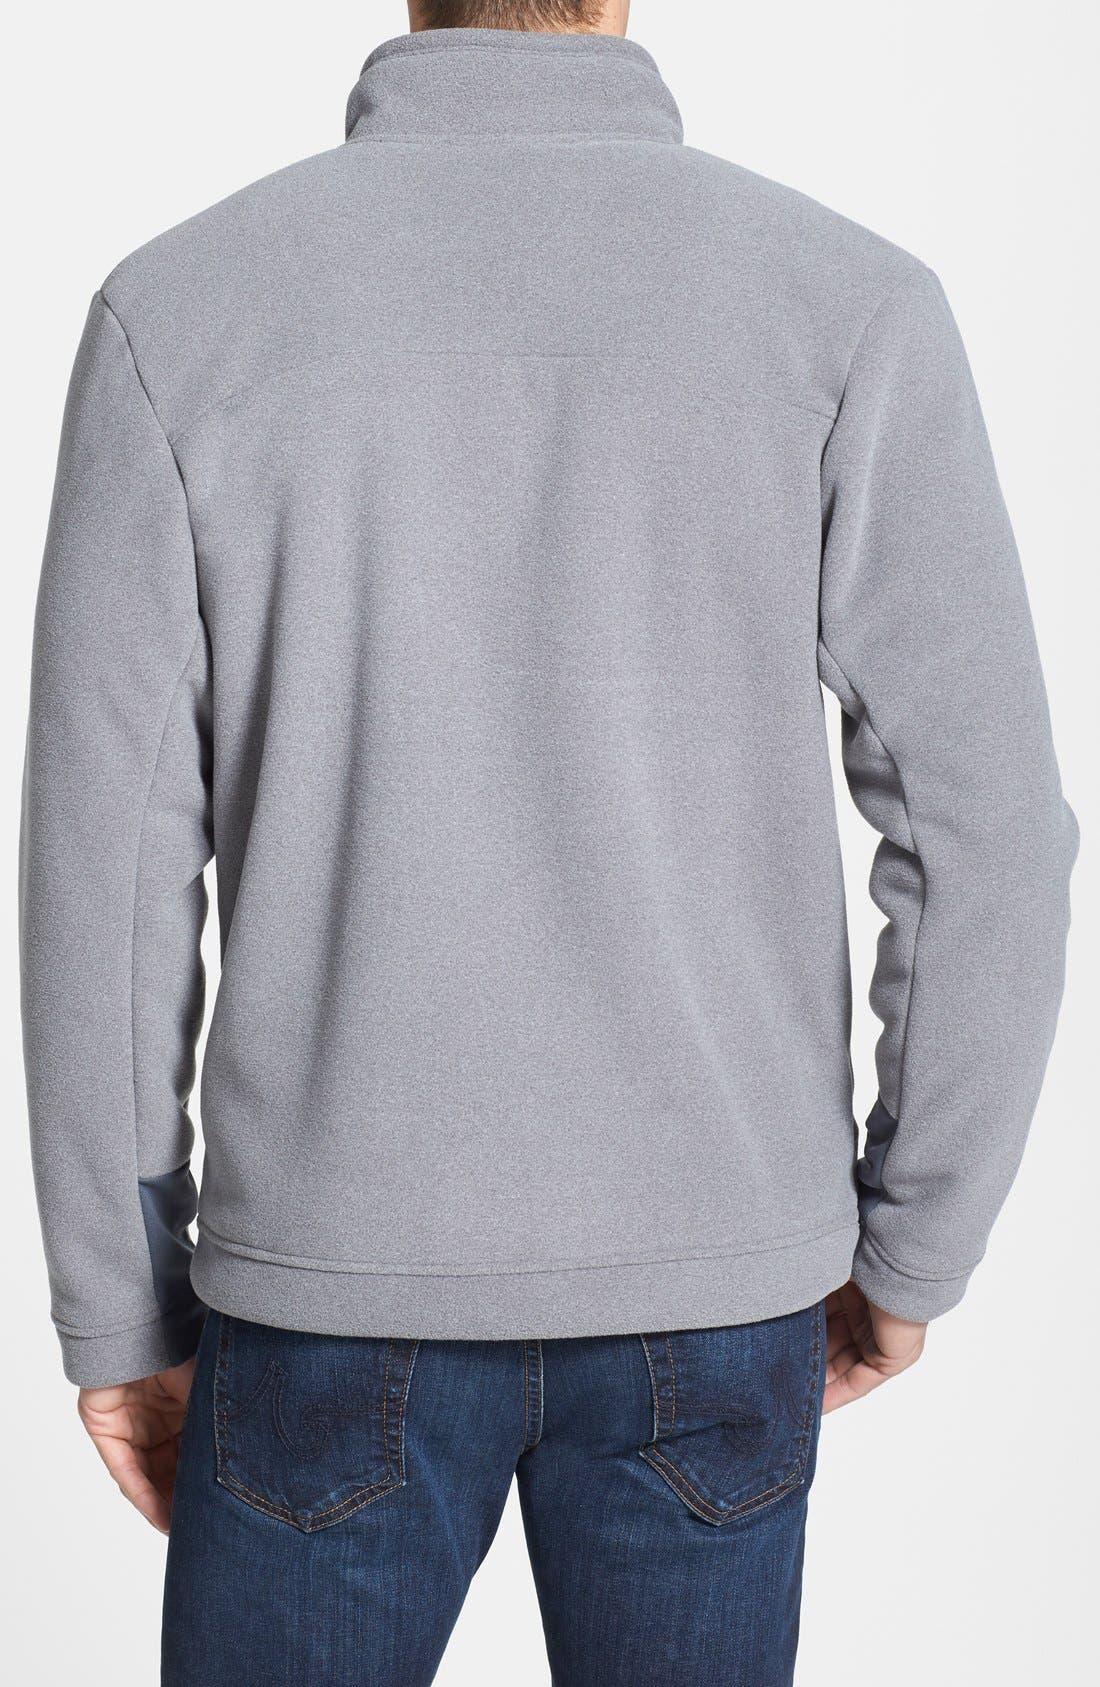 'Chimborazo' Zip Front Fleece Jacket,                             Alternate thumbnail 22, color,